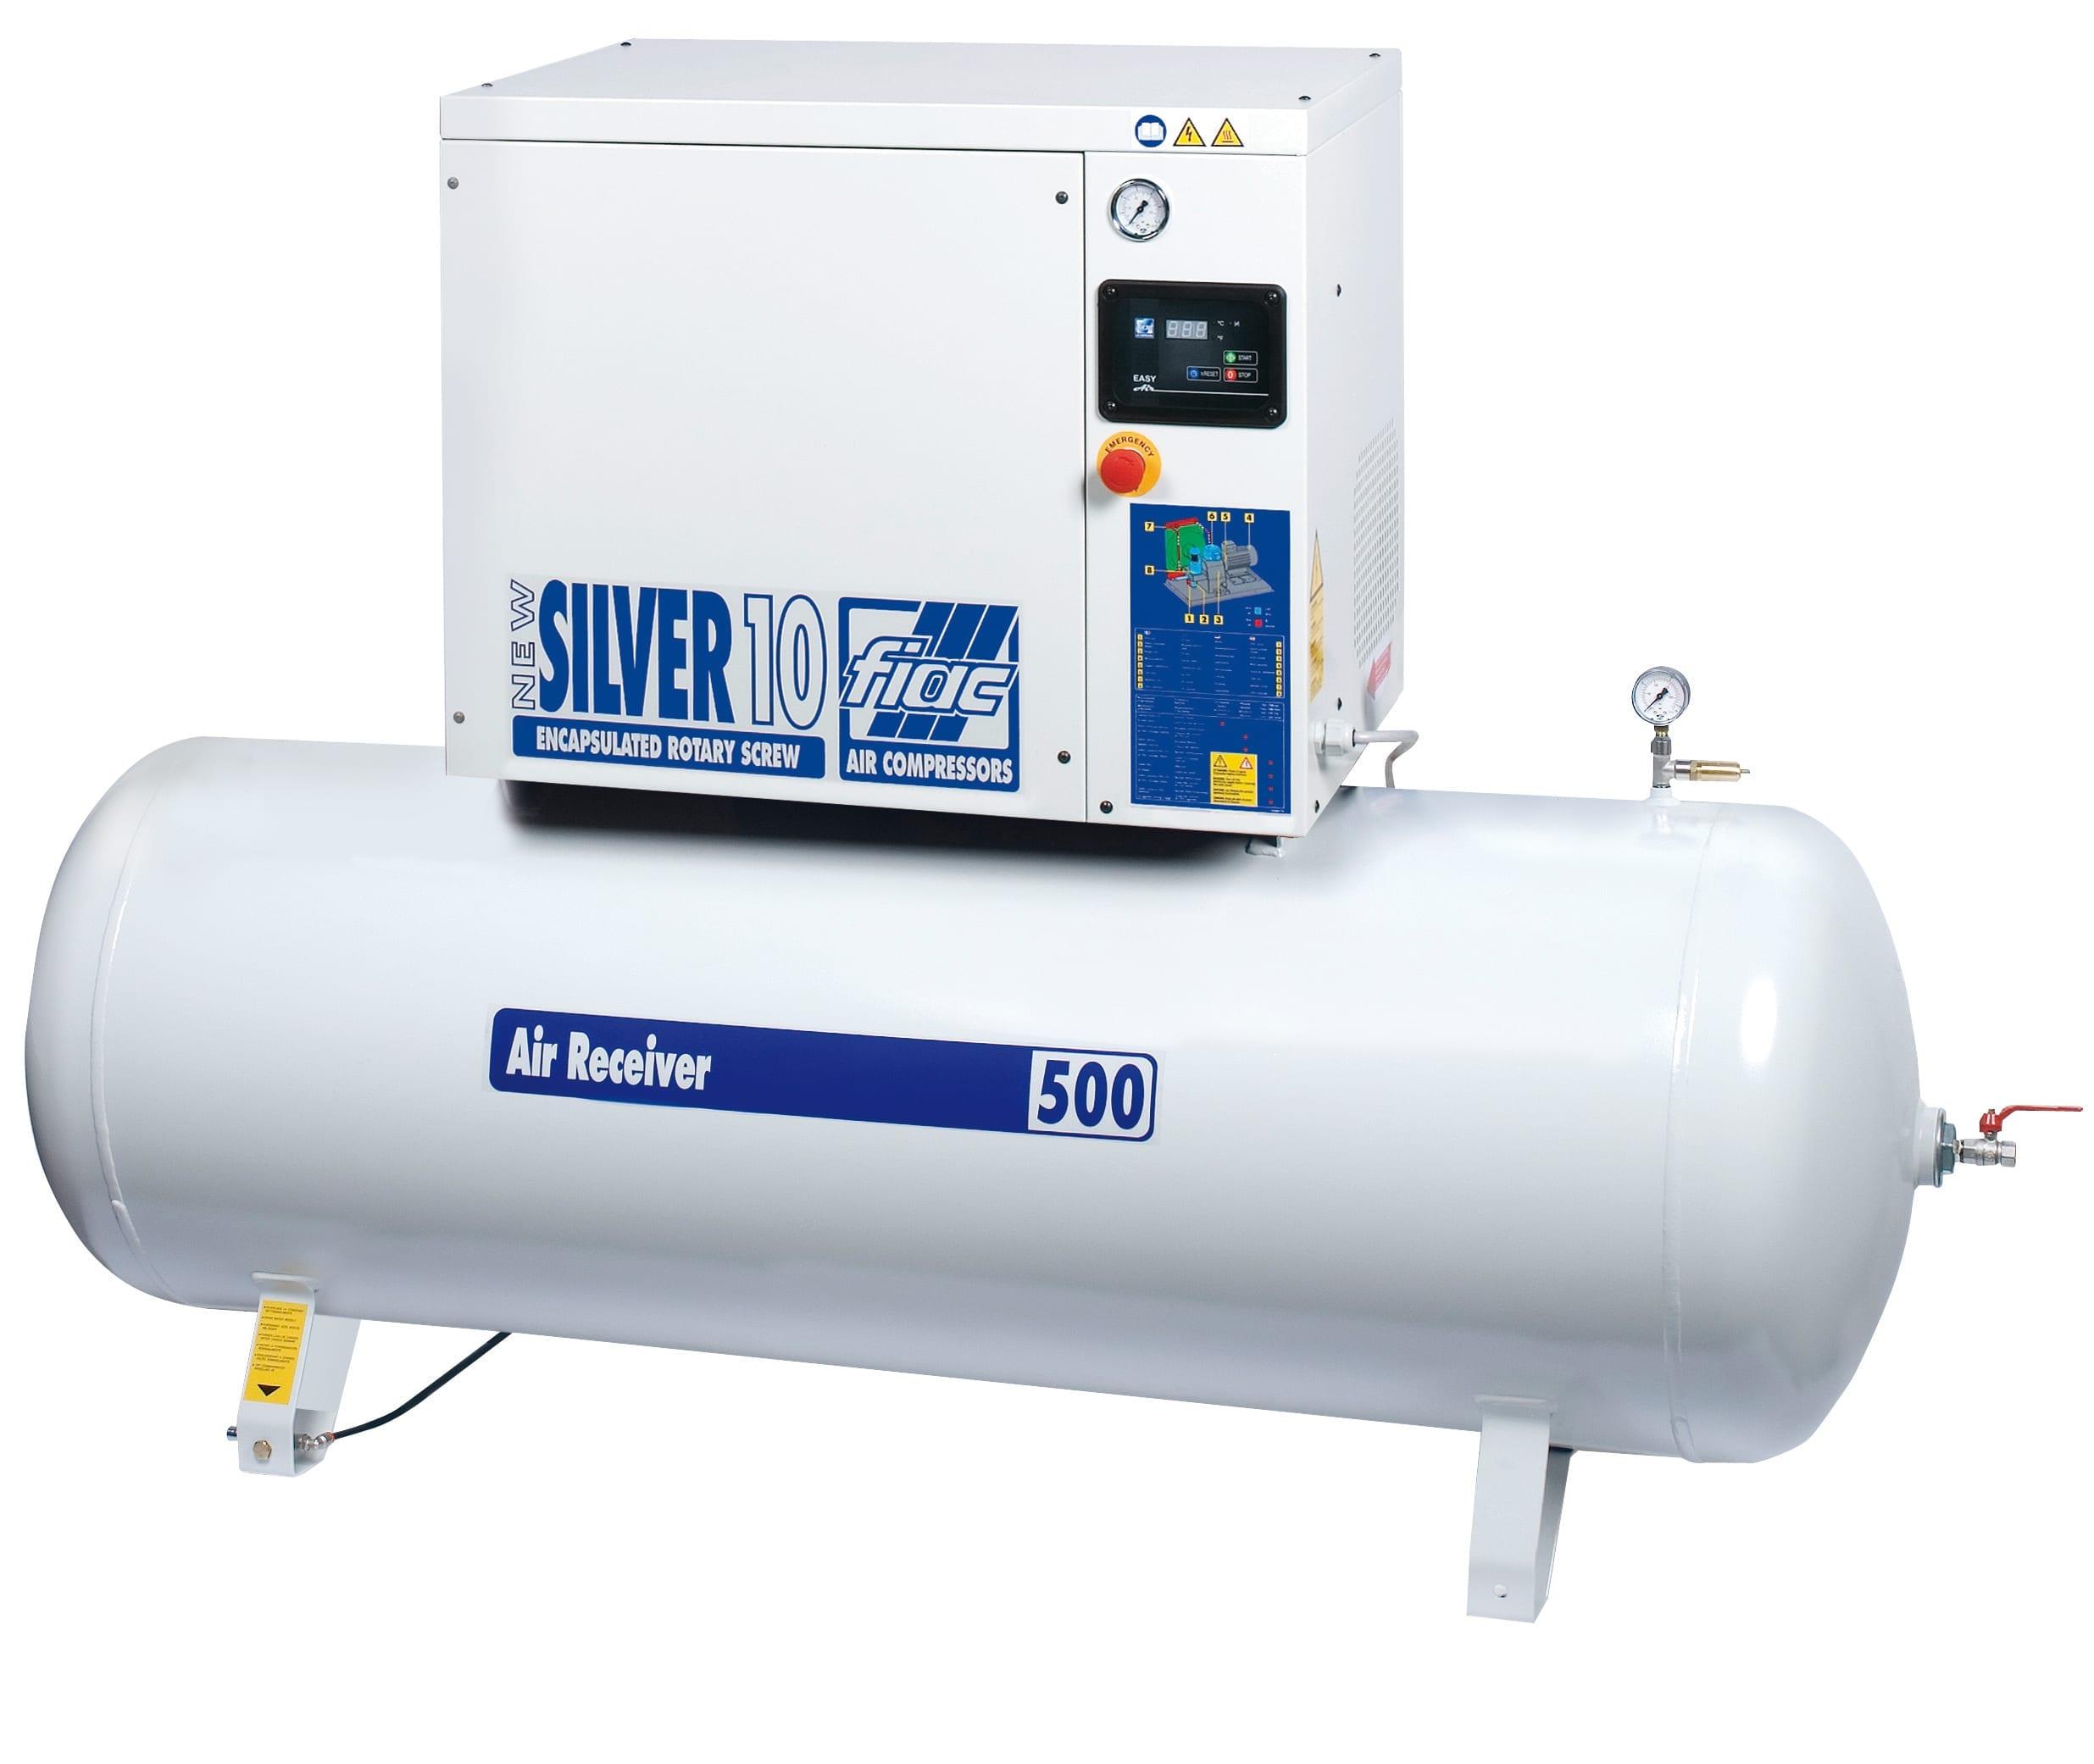 Fiac Silver Rotary Screw 25 500 Air Compressor